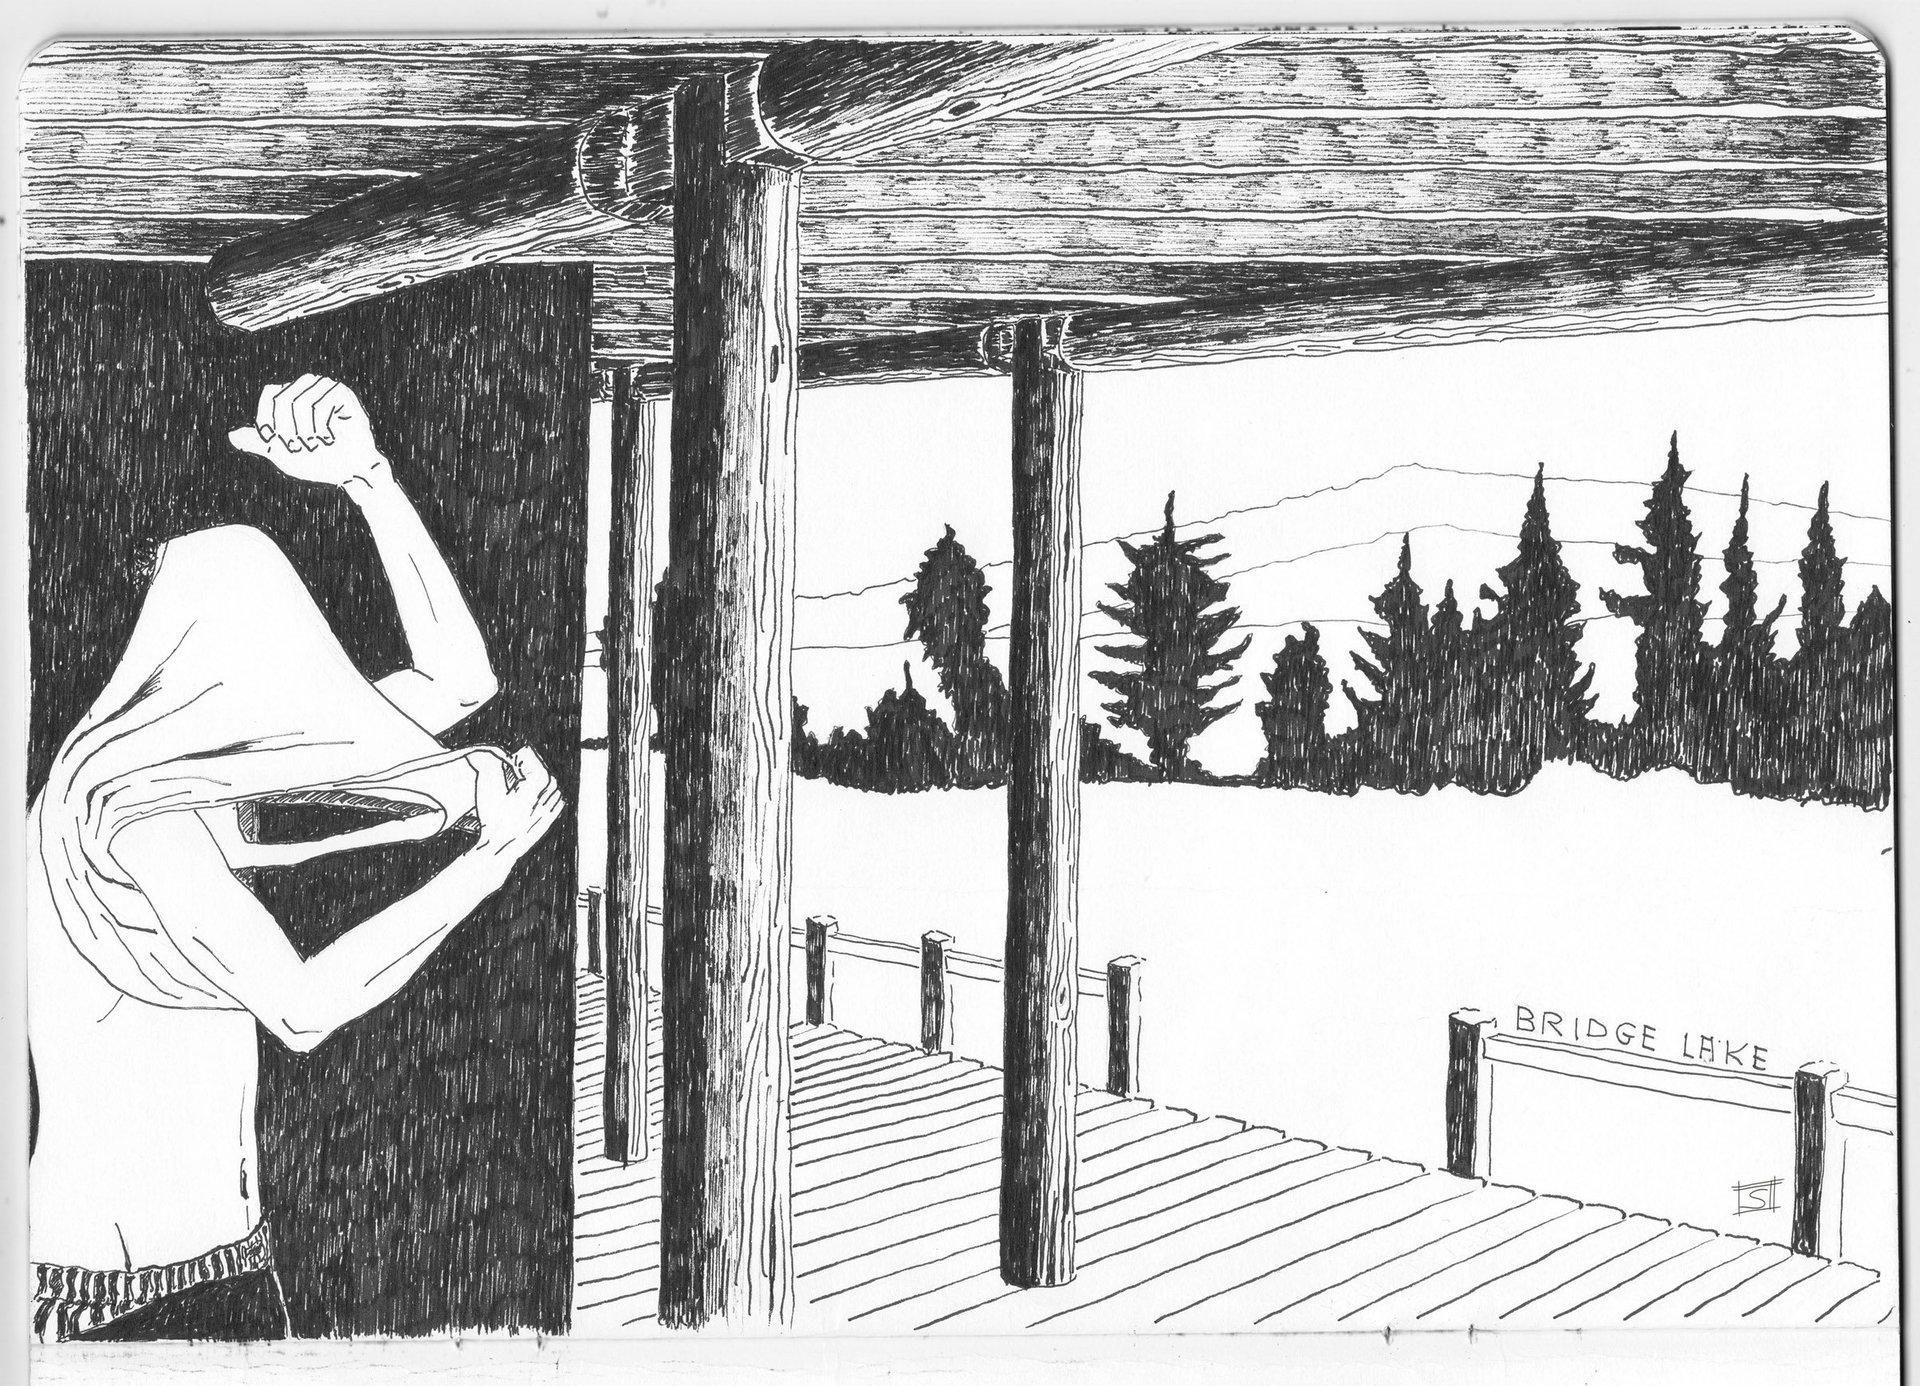 Sebastiano Toma sketches of Canada - Bridge Lake